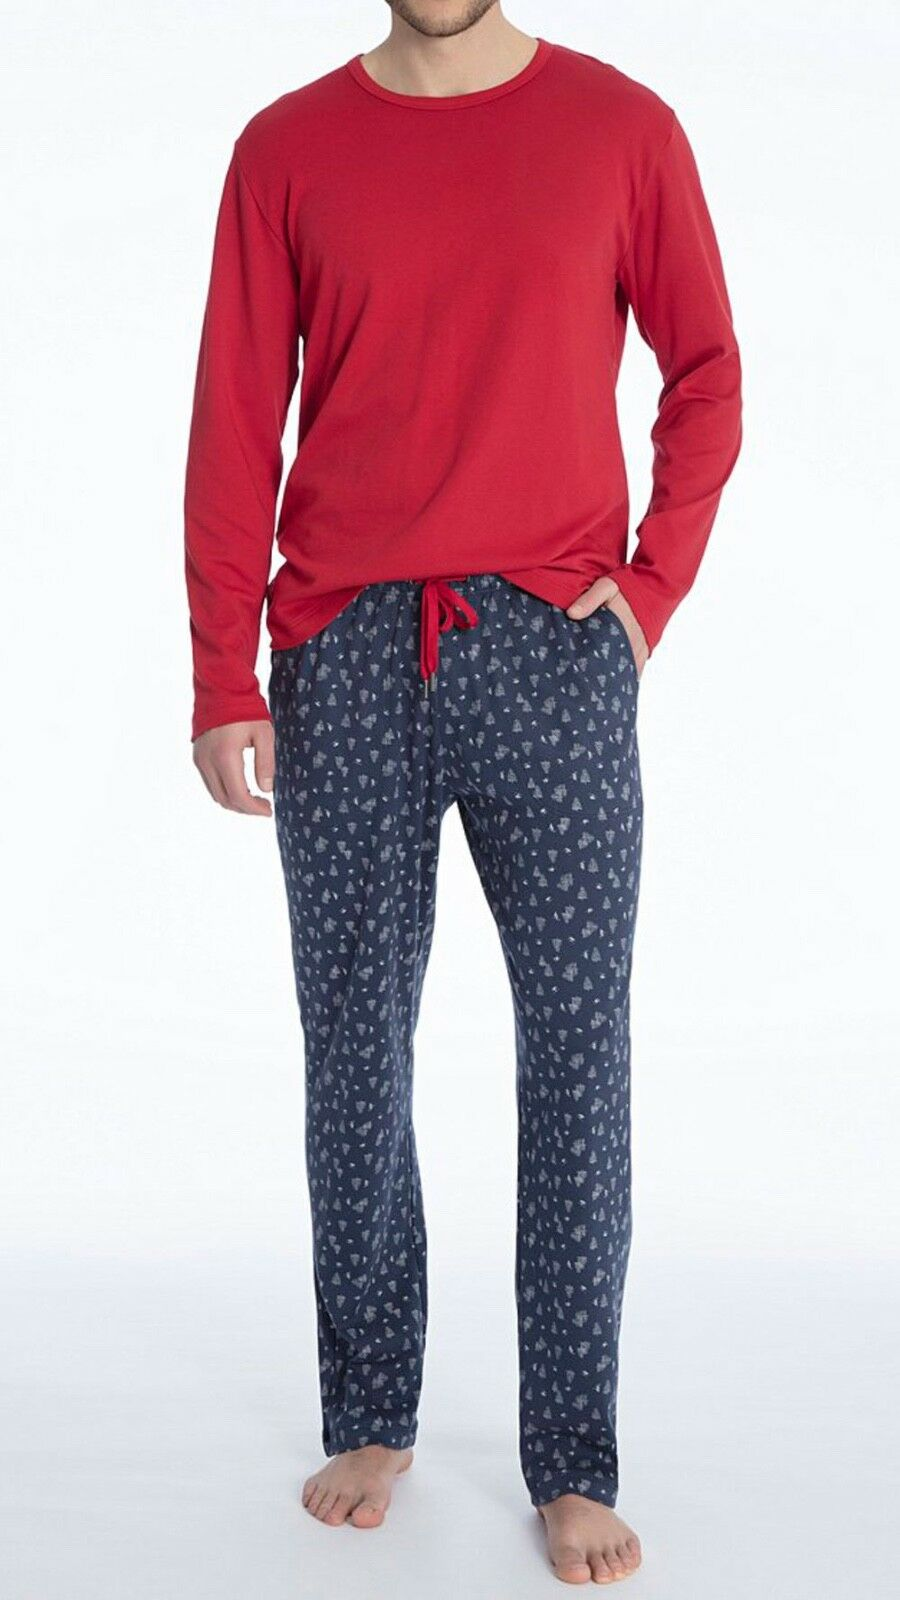 CALIDA Pyjama Weihnachten M indigo mood 41819